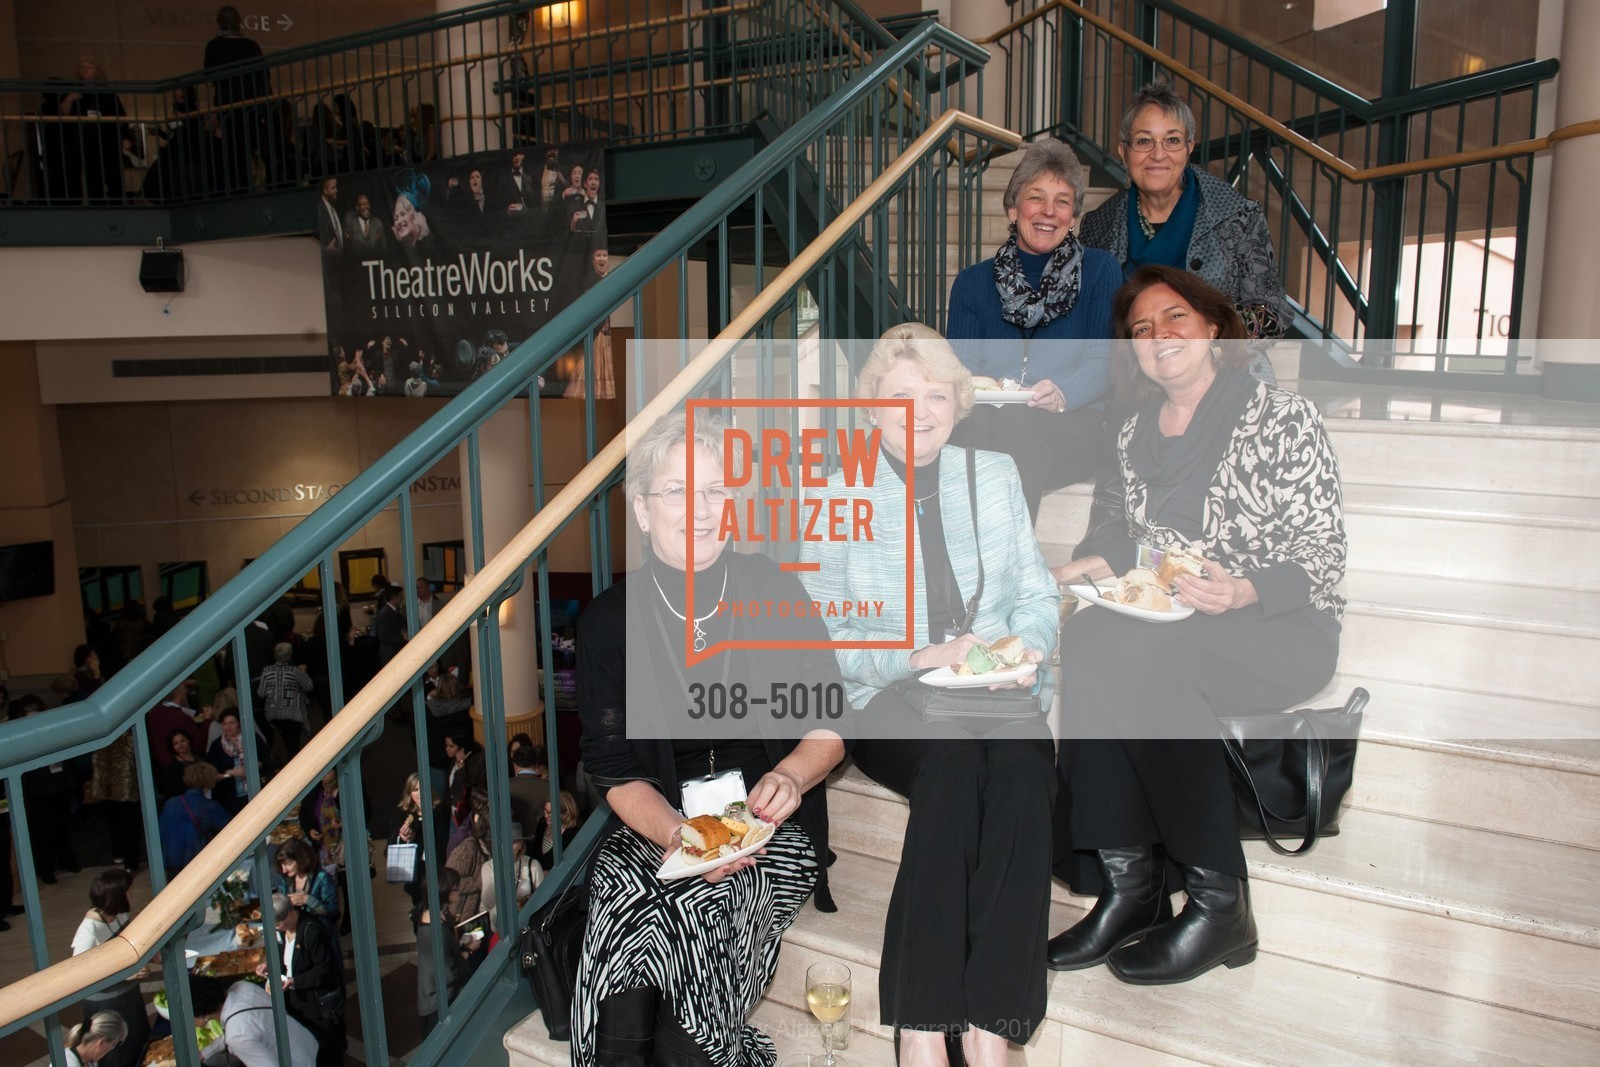 Judy Blood, Jeannie Bruins, Linda Stevenin, Pat James, Lisa Webster, Photo #308-5010